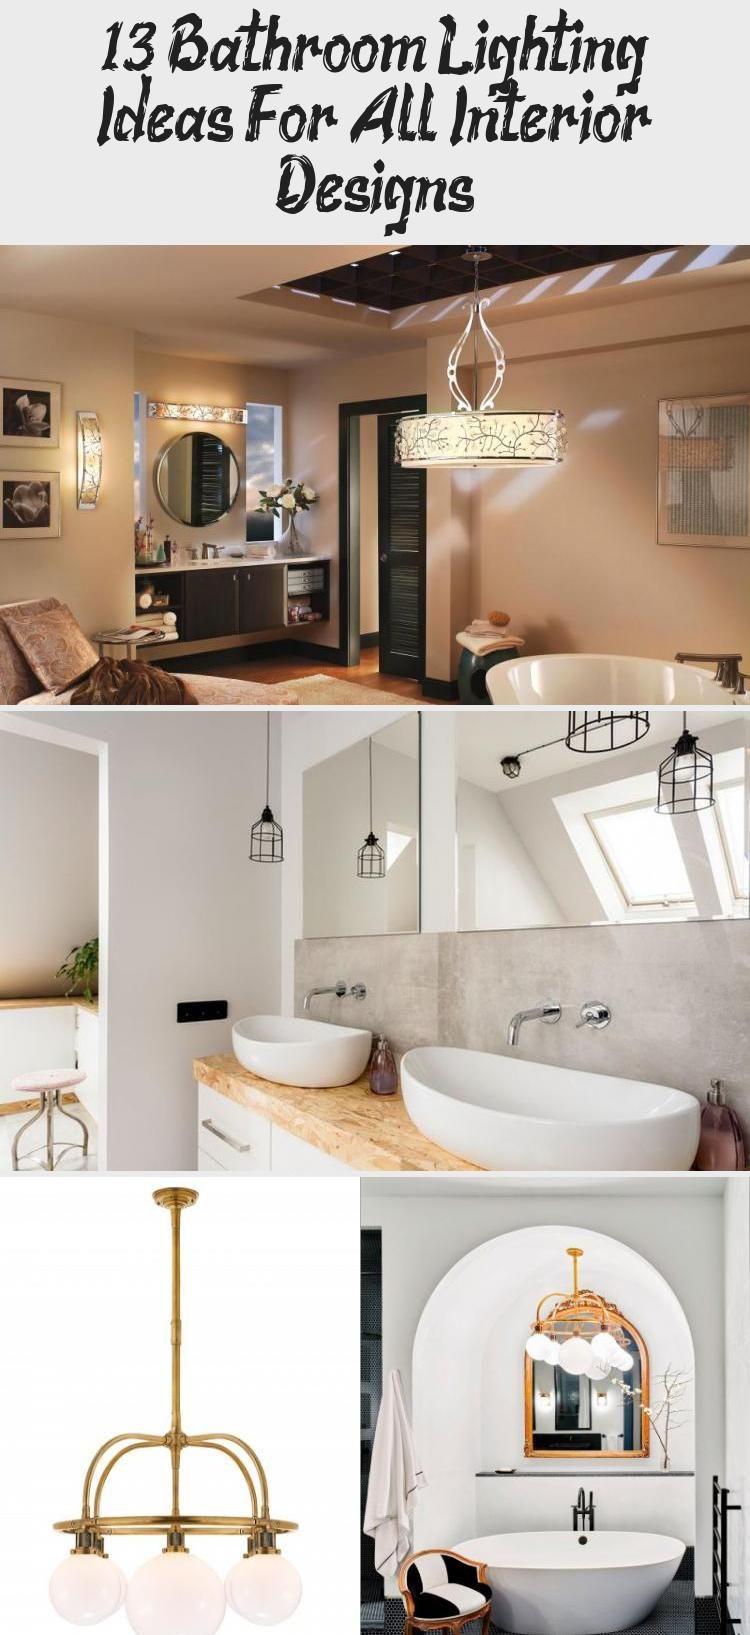 13 Bathroom Lighting Ideas For All Interior Designs Decorative